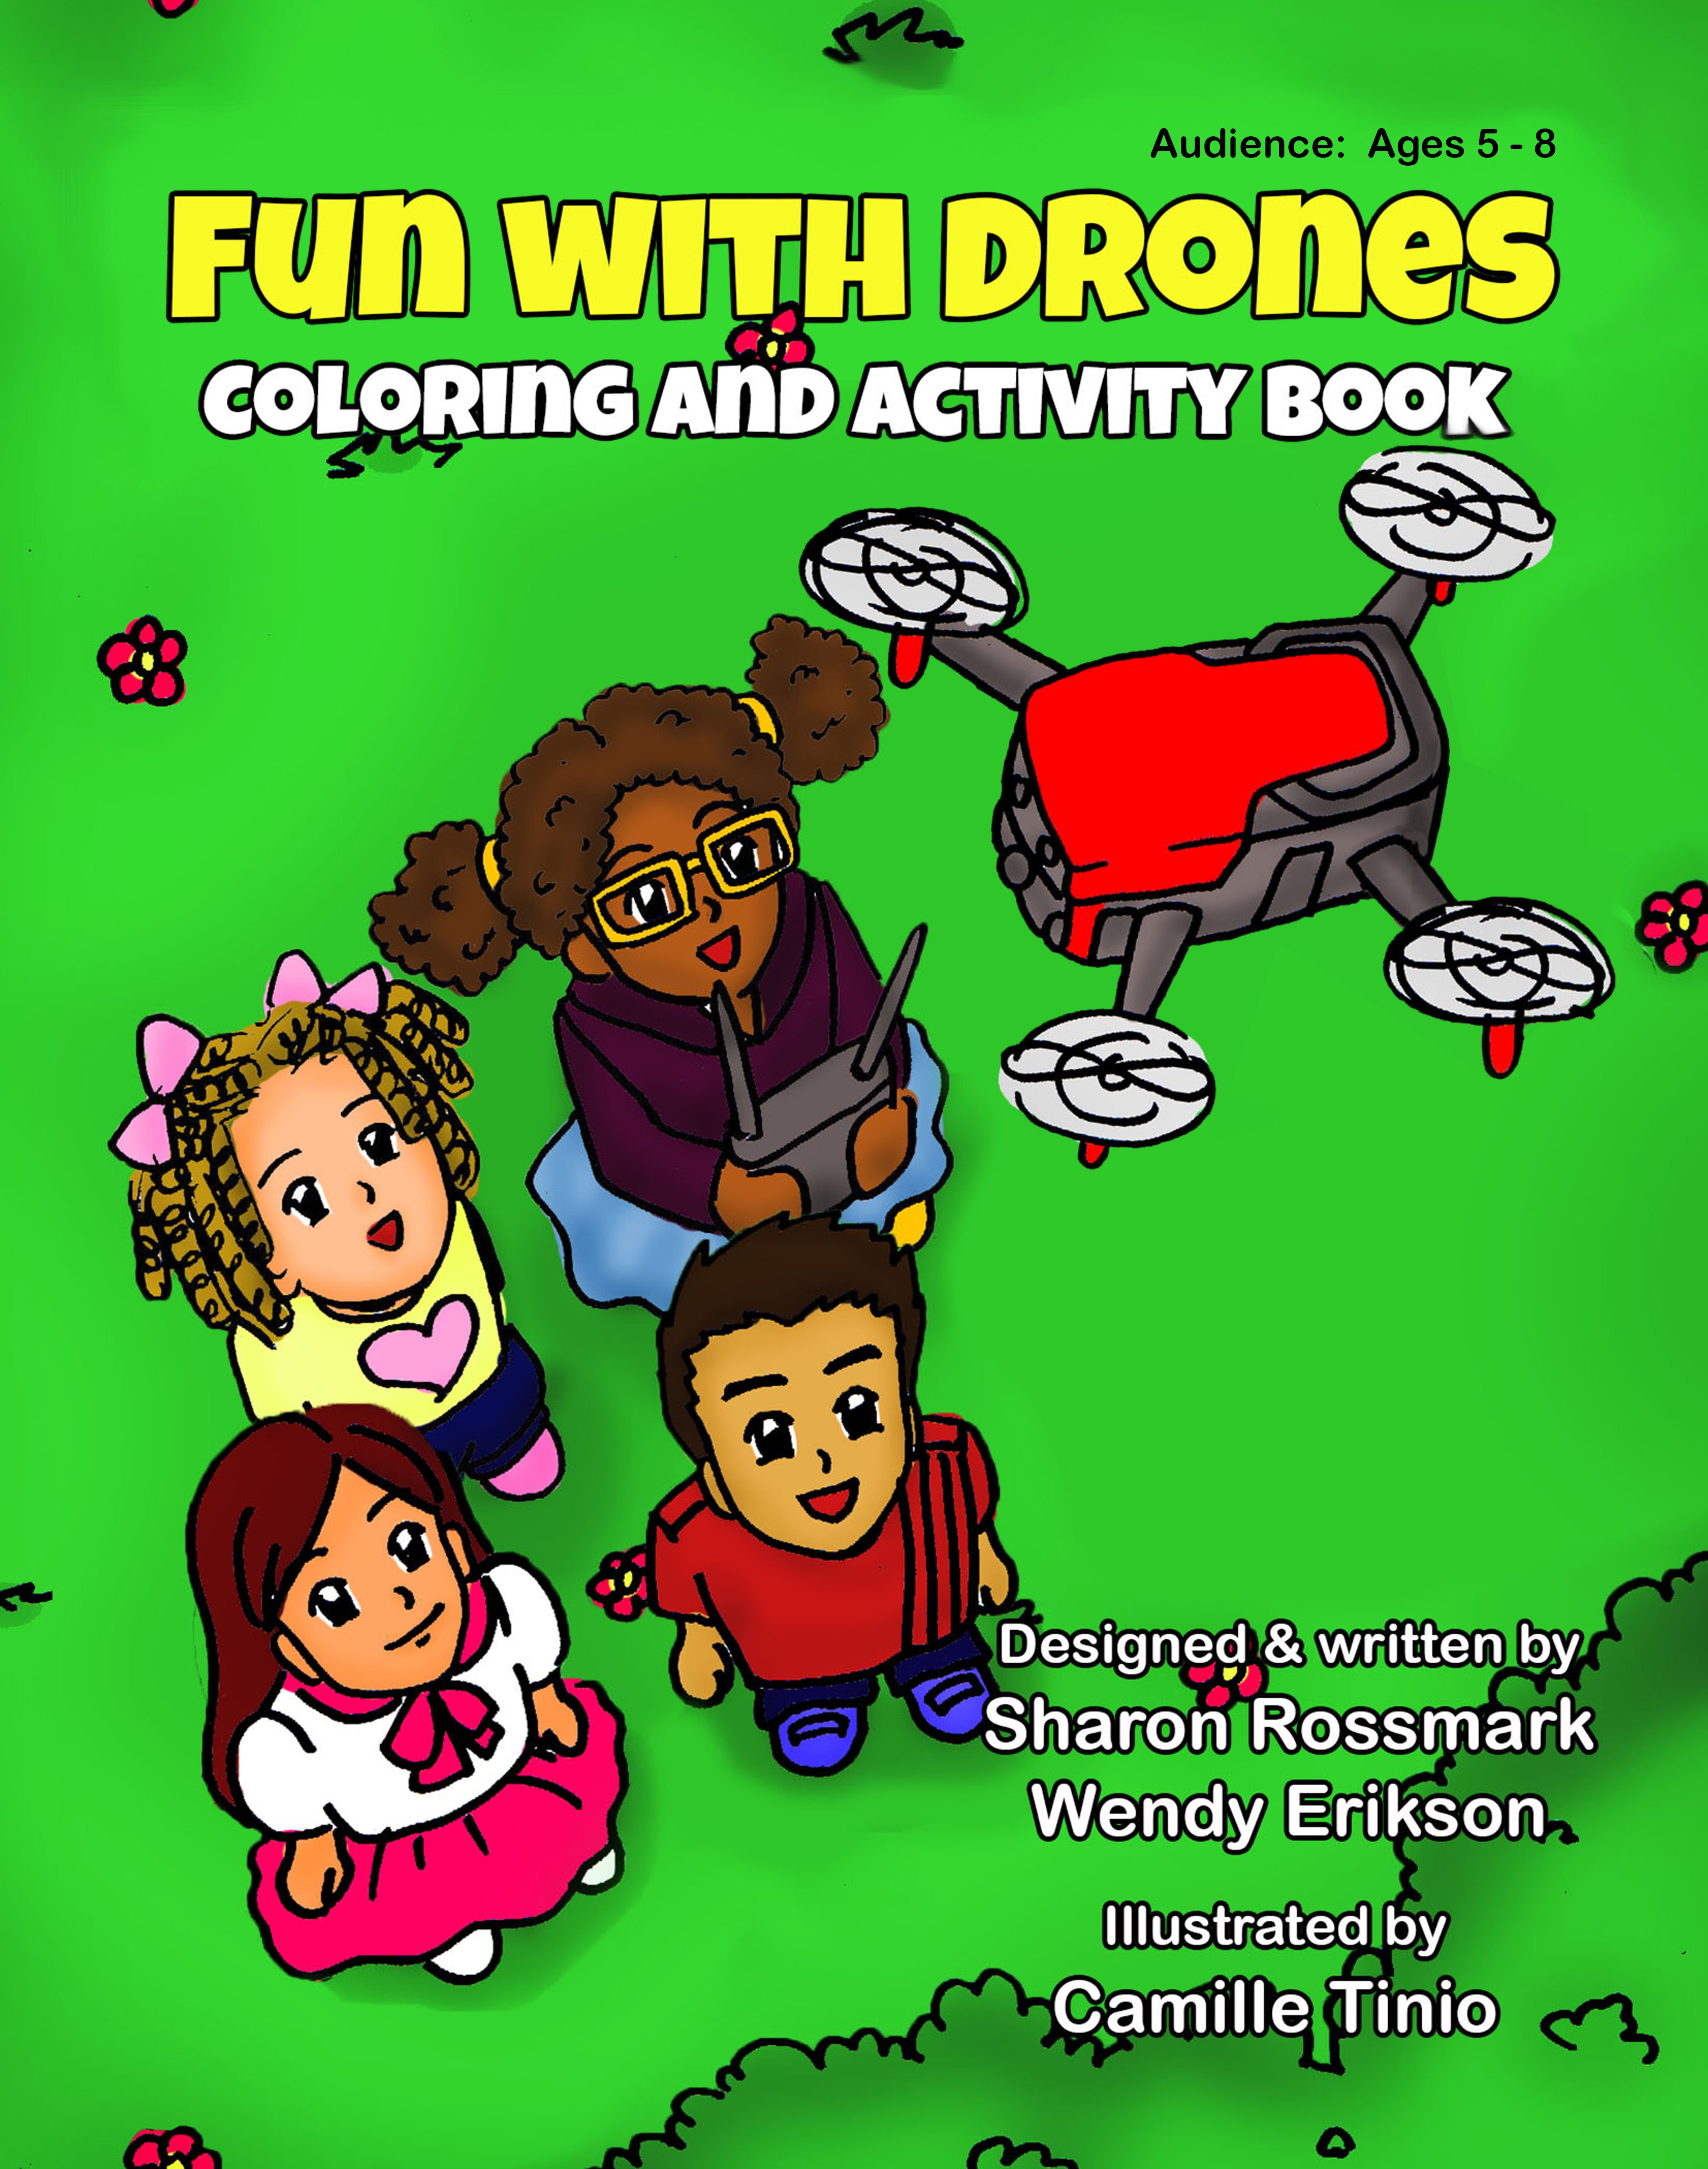 drone books coloring sharon rossmark amazon stem coloring